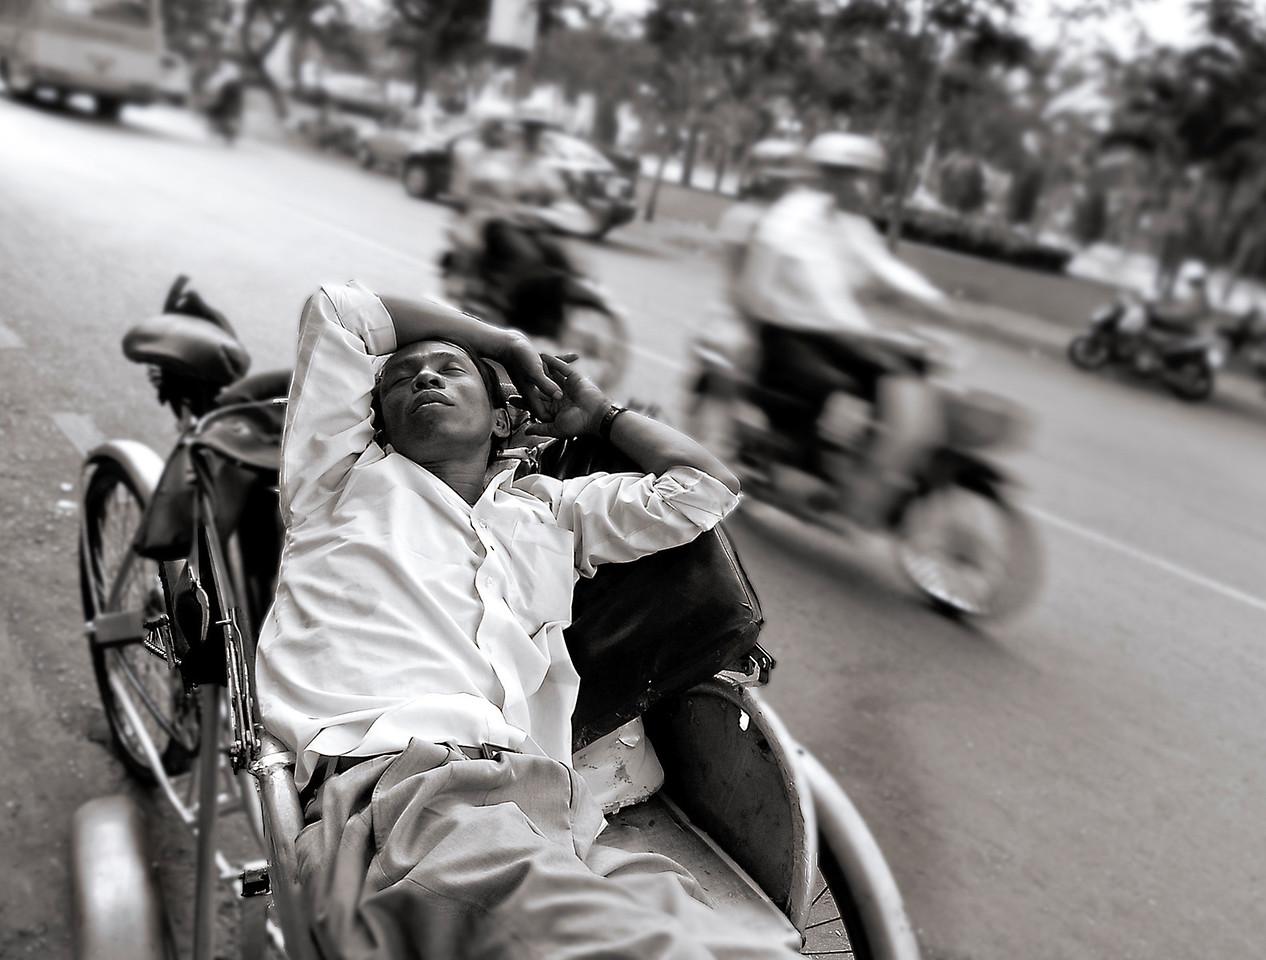 Rickshaw driver takes an afternoon nap in a busy Saigon Street. <br /> <br /> Saigon, Vietnam, 2008